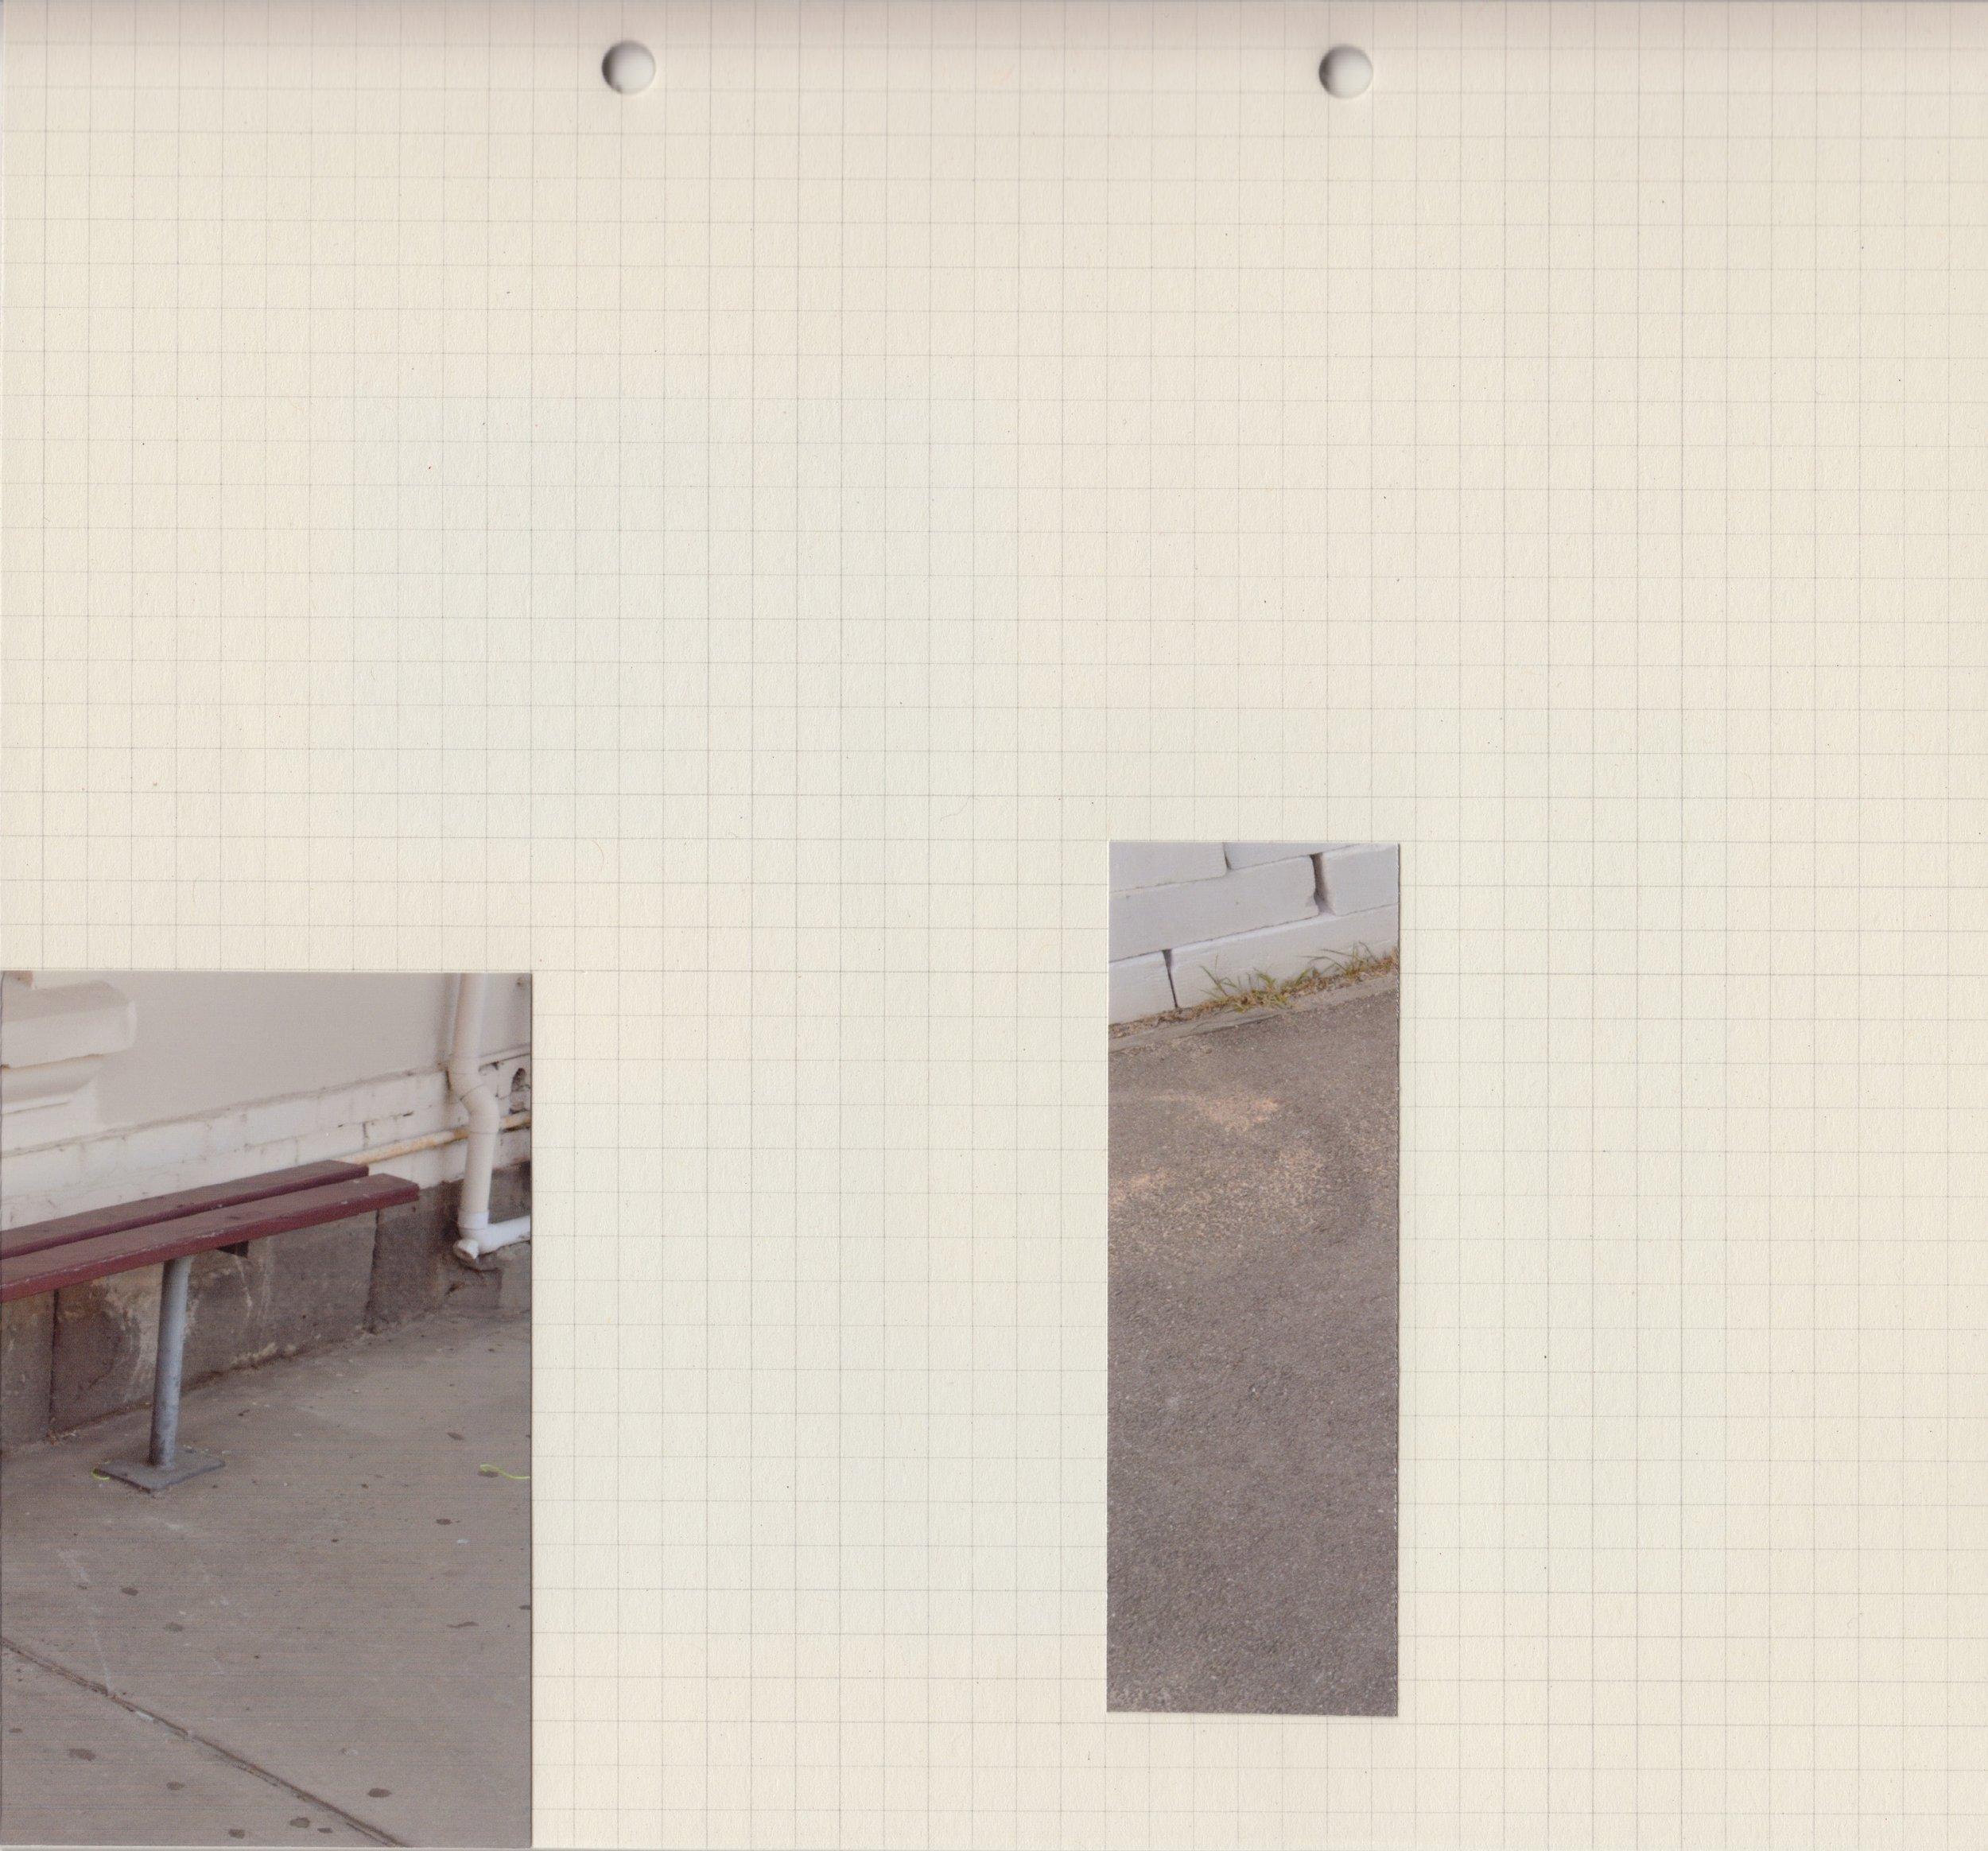 Remnant-collage 3.jpeg